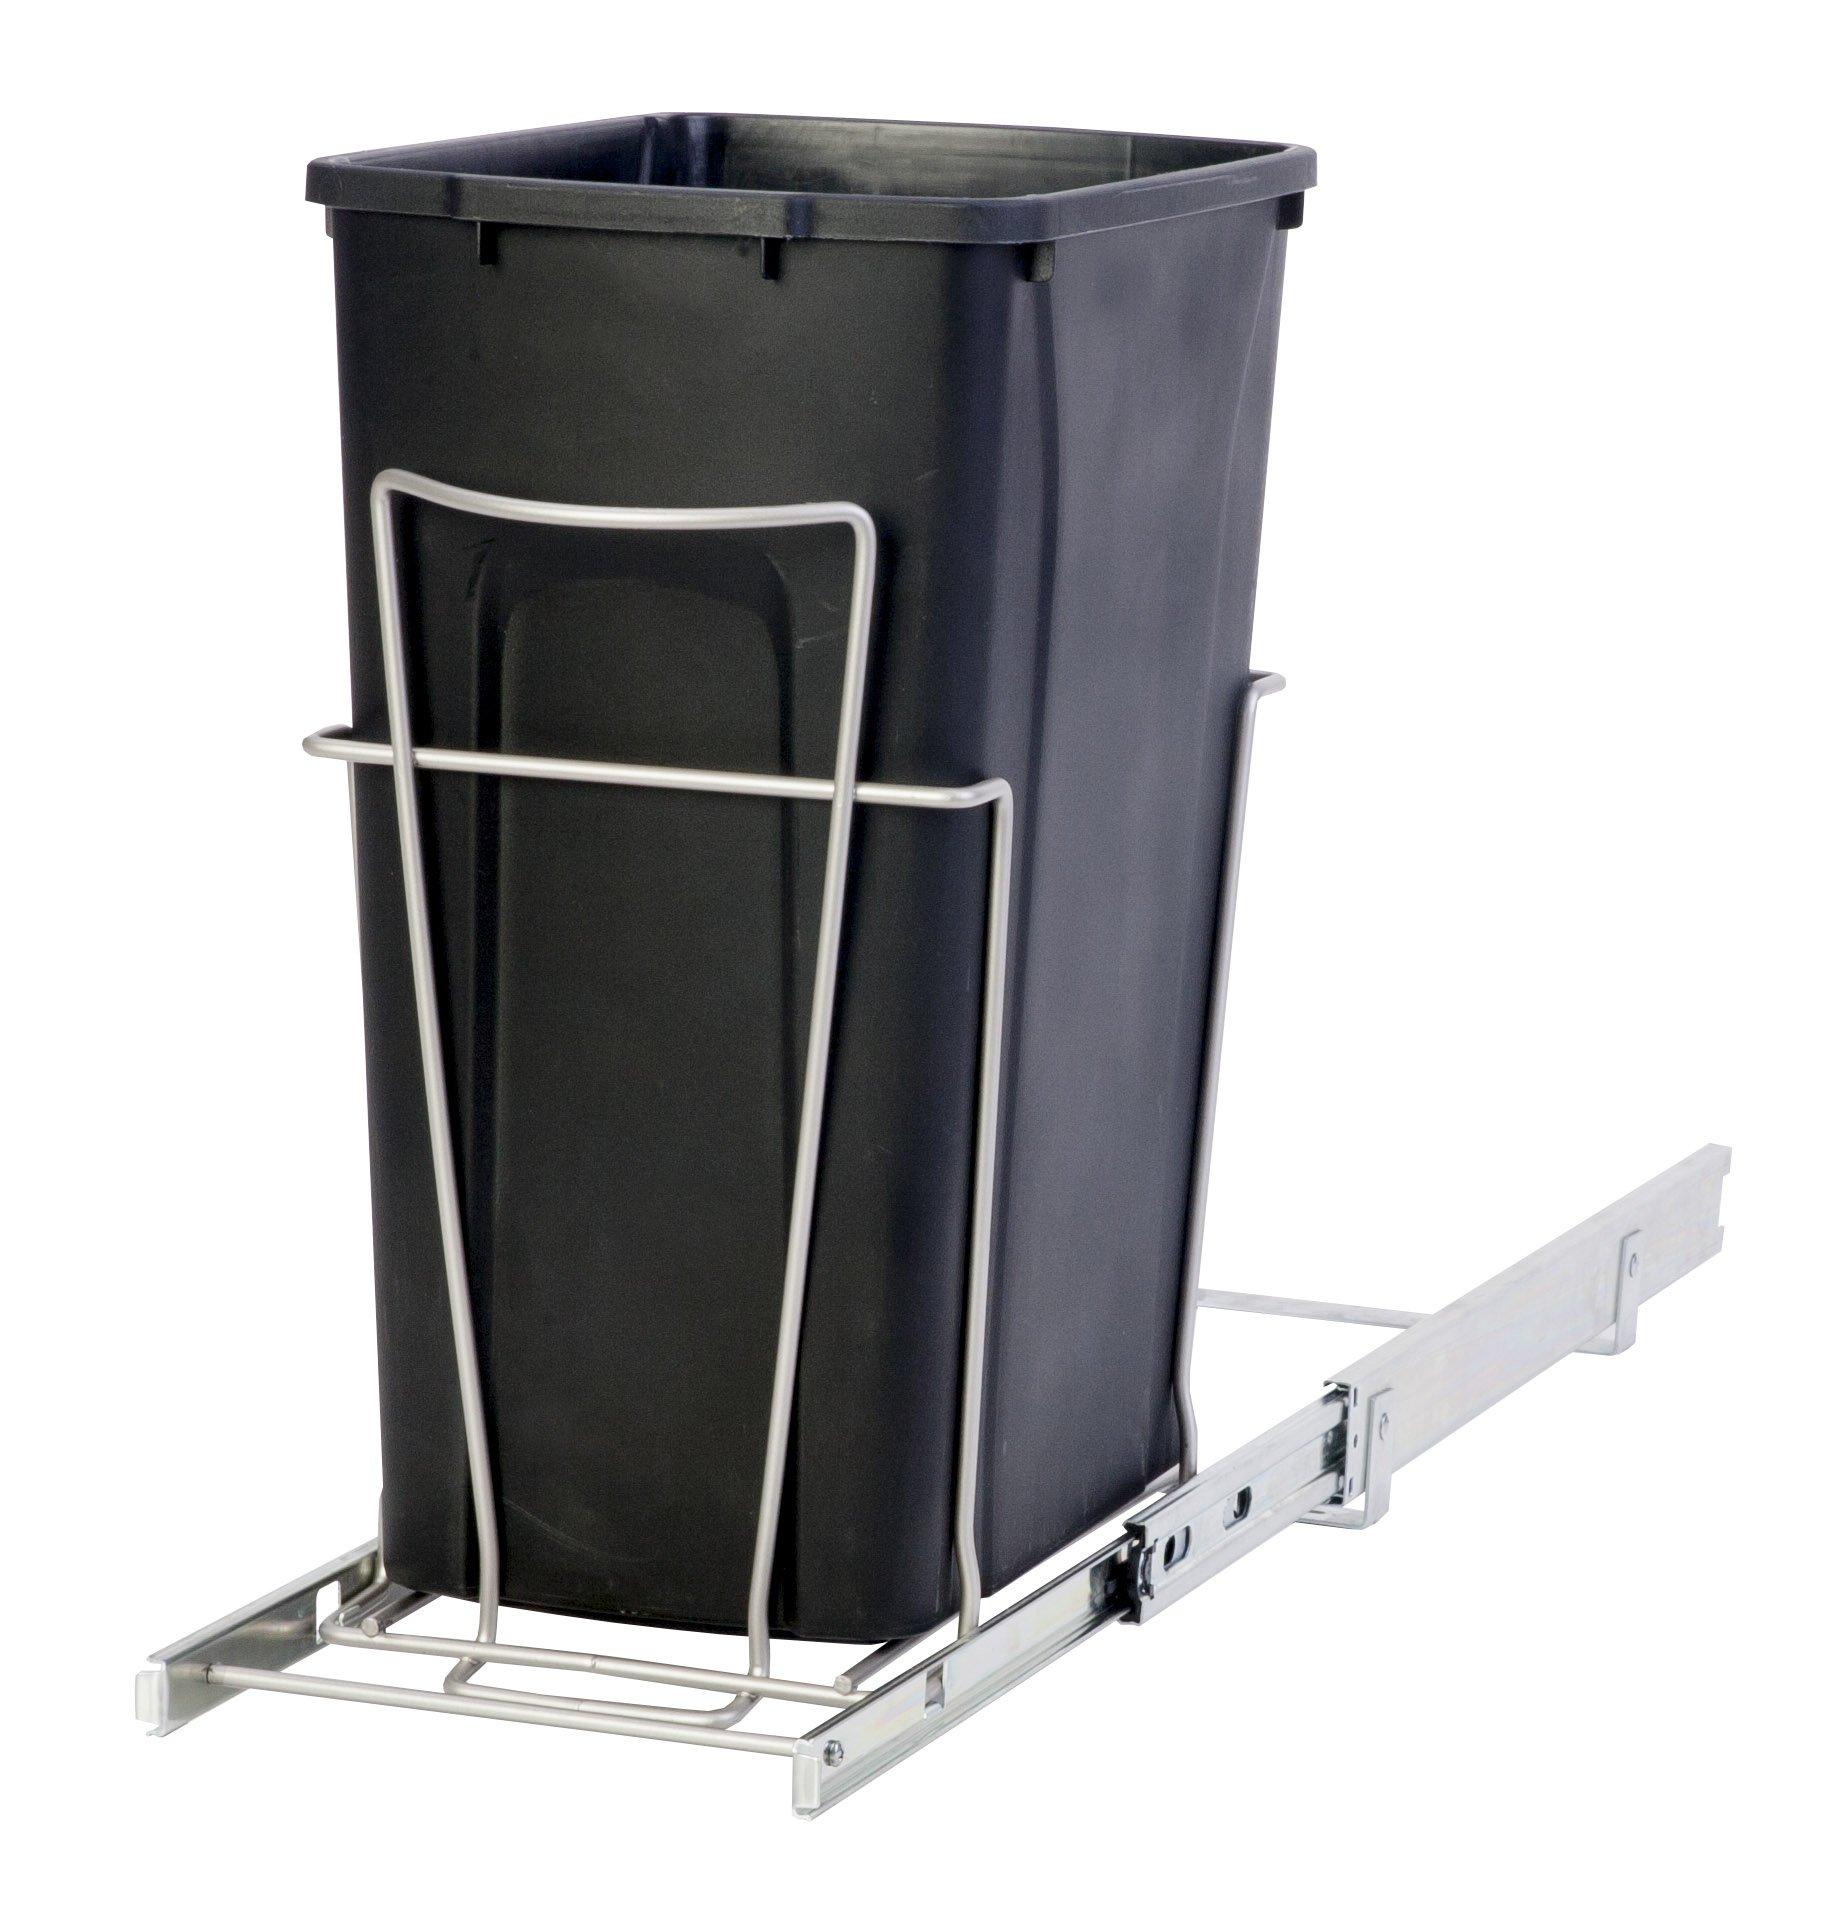 Panacea Grayline Single Trash Can Slide Out Basket Storage, Satin Nickel